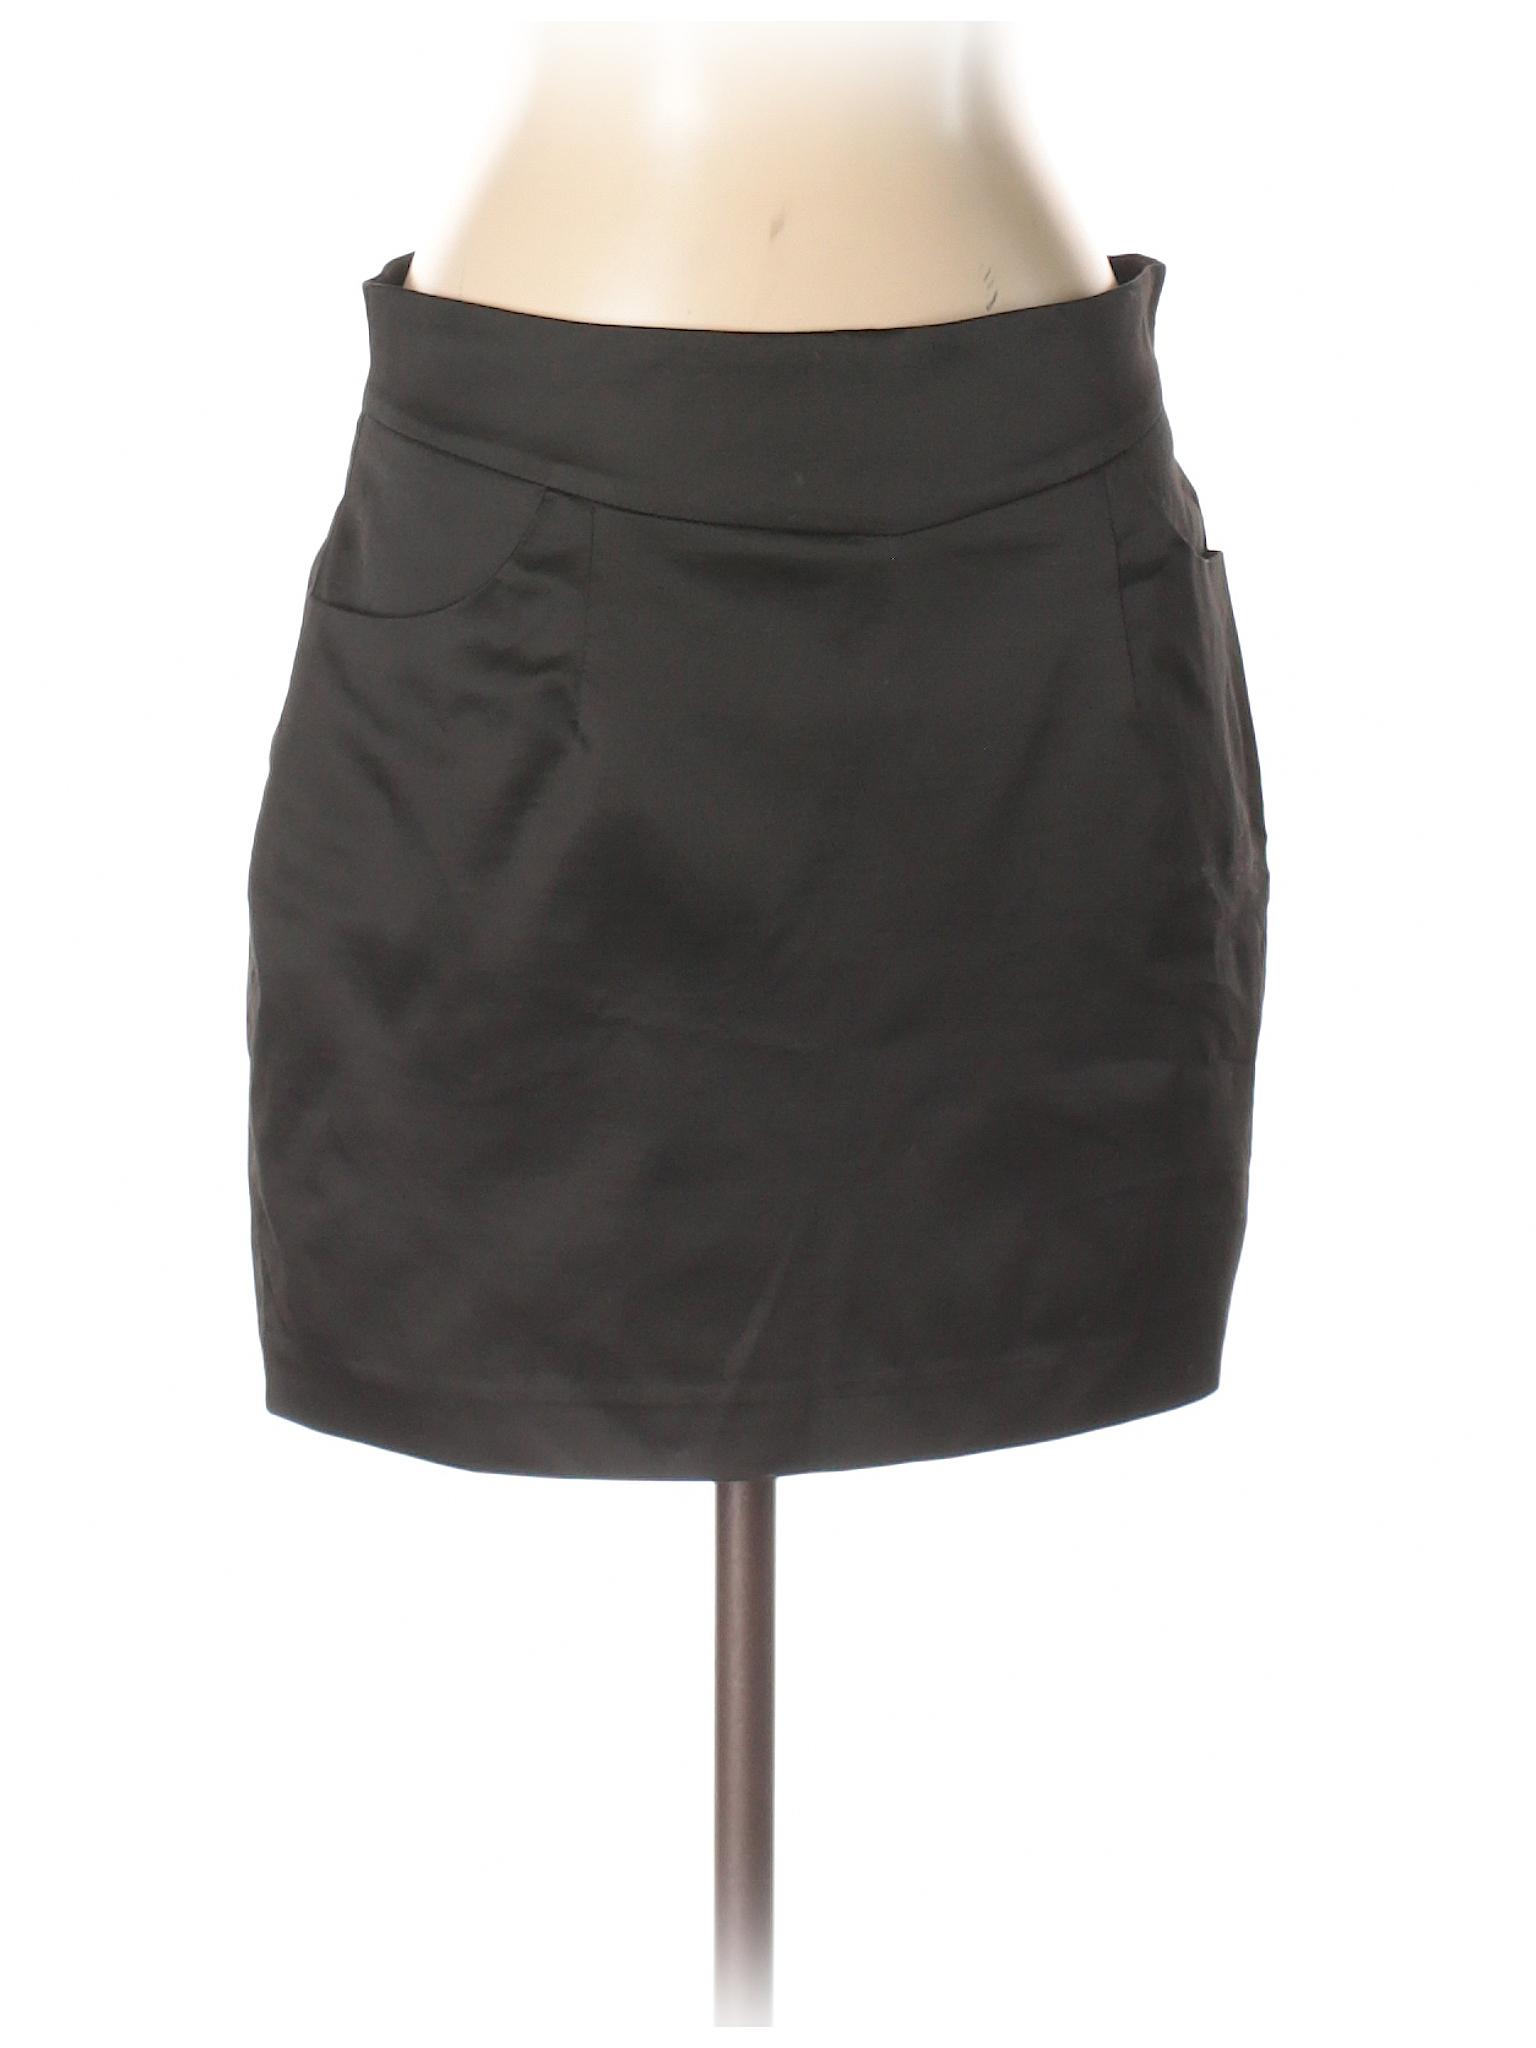 Casual Casual Casual Boutique Boutique Boutique Boutique Skirt Skirt Skirt gqSF55